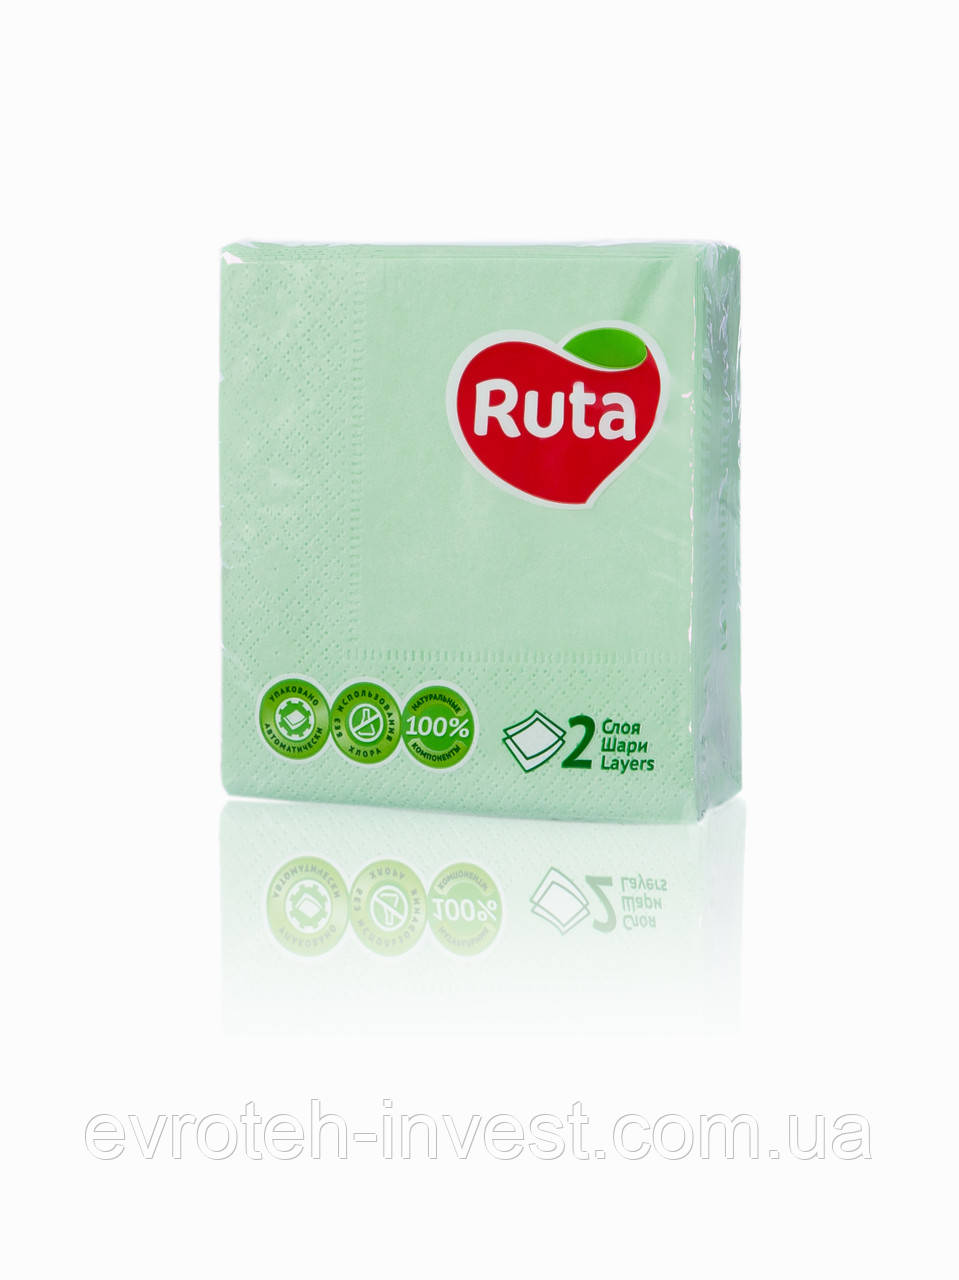 Салфетки RUTA Double Luxe 40 листов двухслойные 24х24 зеленые